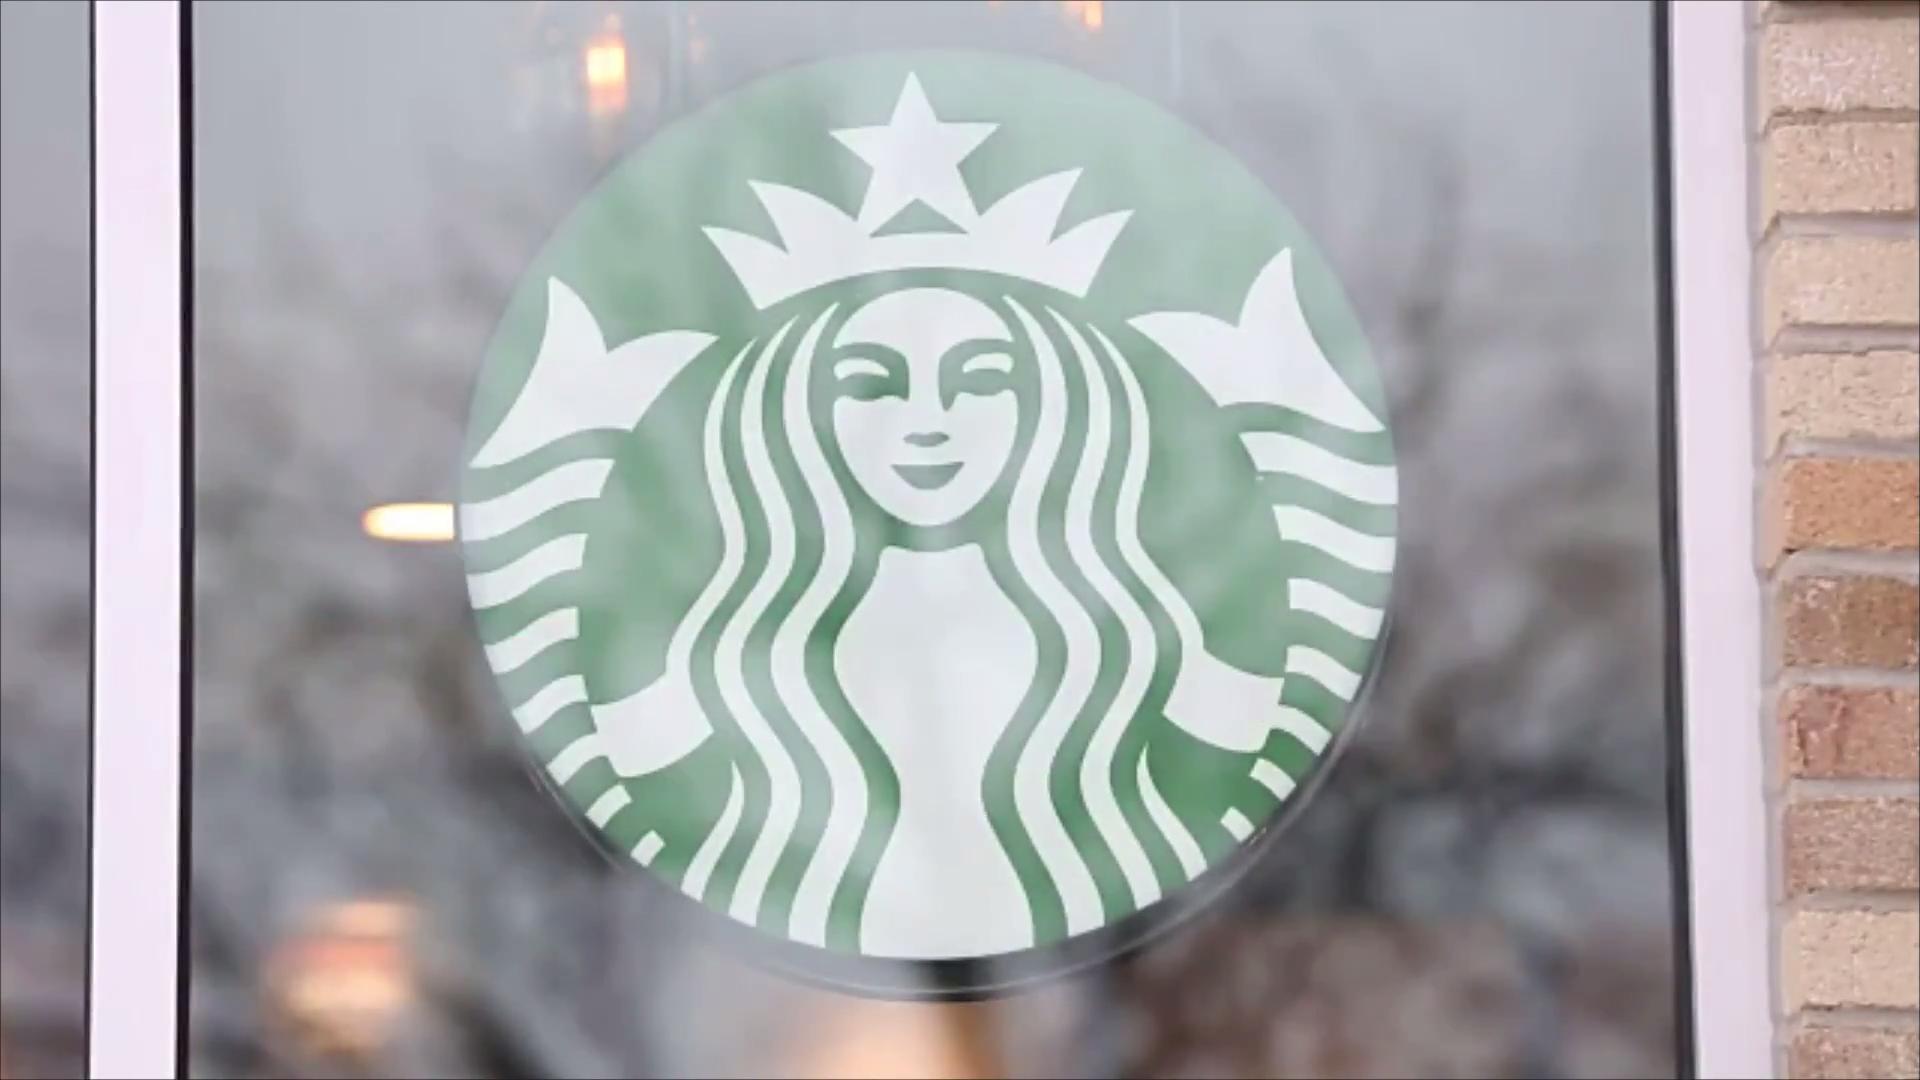 Starbucks Removes Its Only Gluten-Free Sandwich Despite Customer Outrage